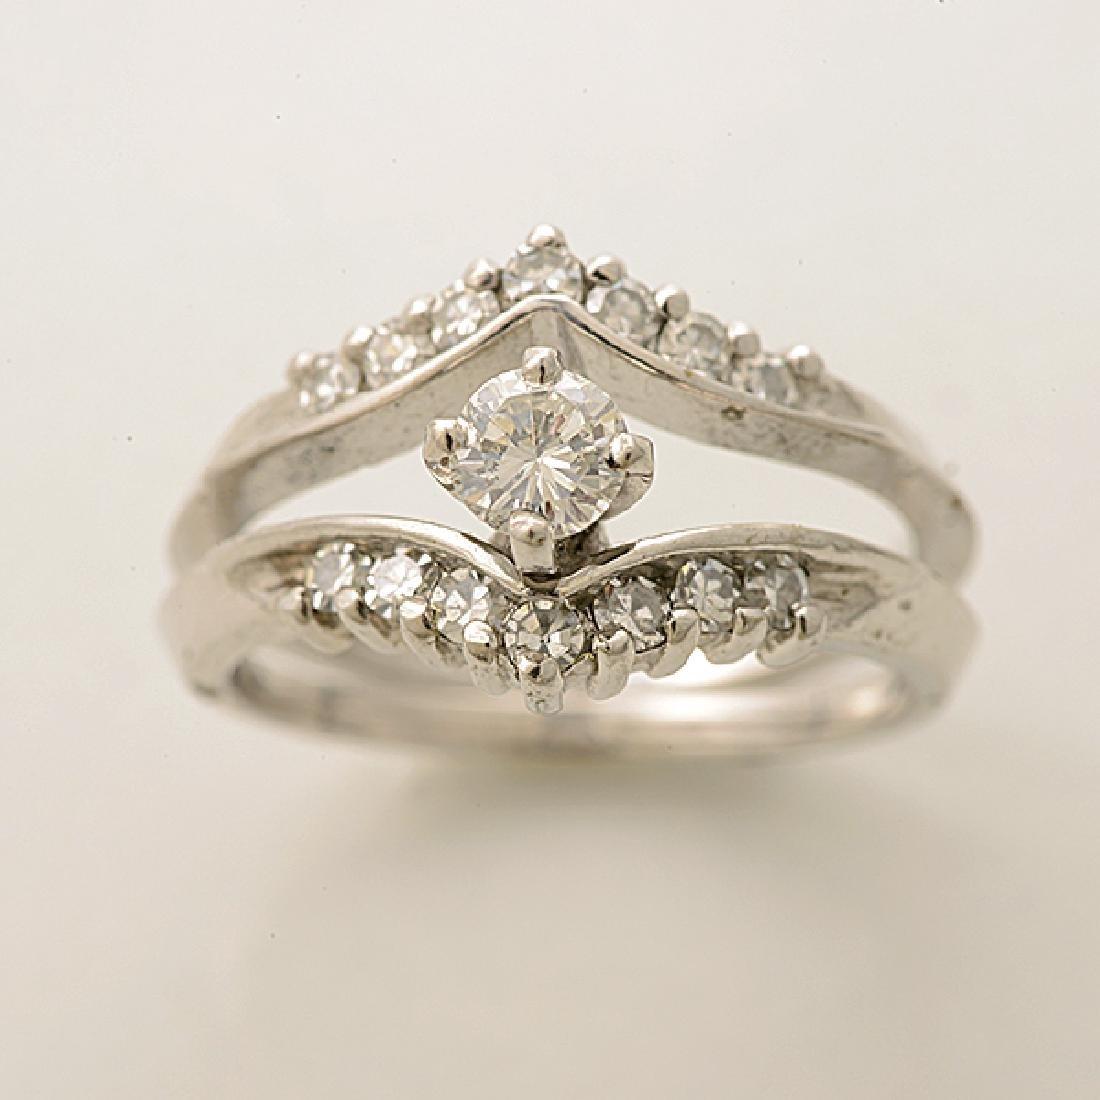 Diamond, 14k White Gold Ring Set. - 2